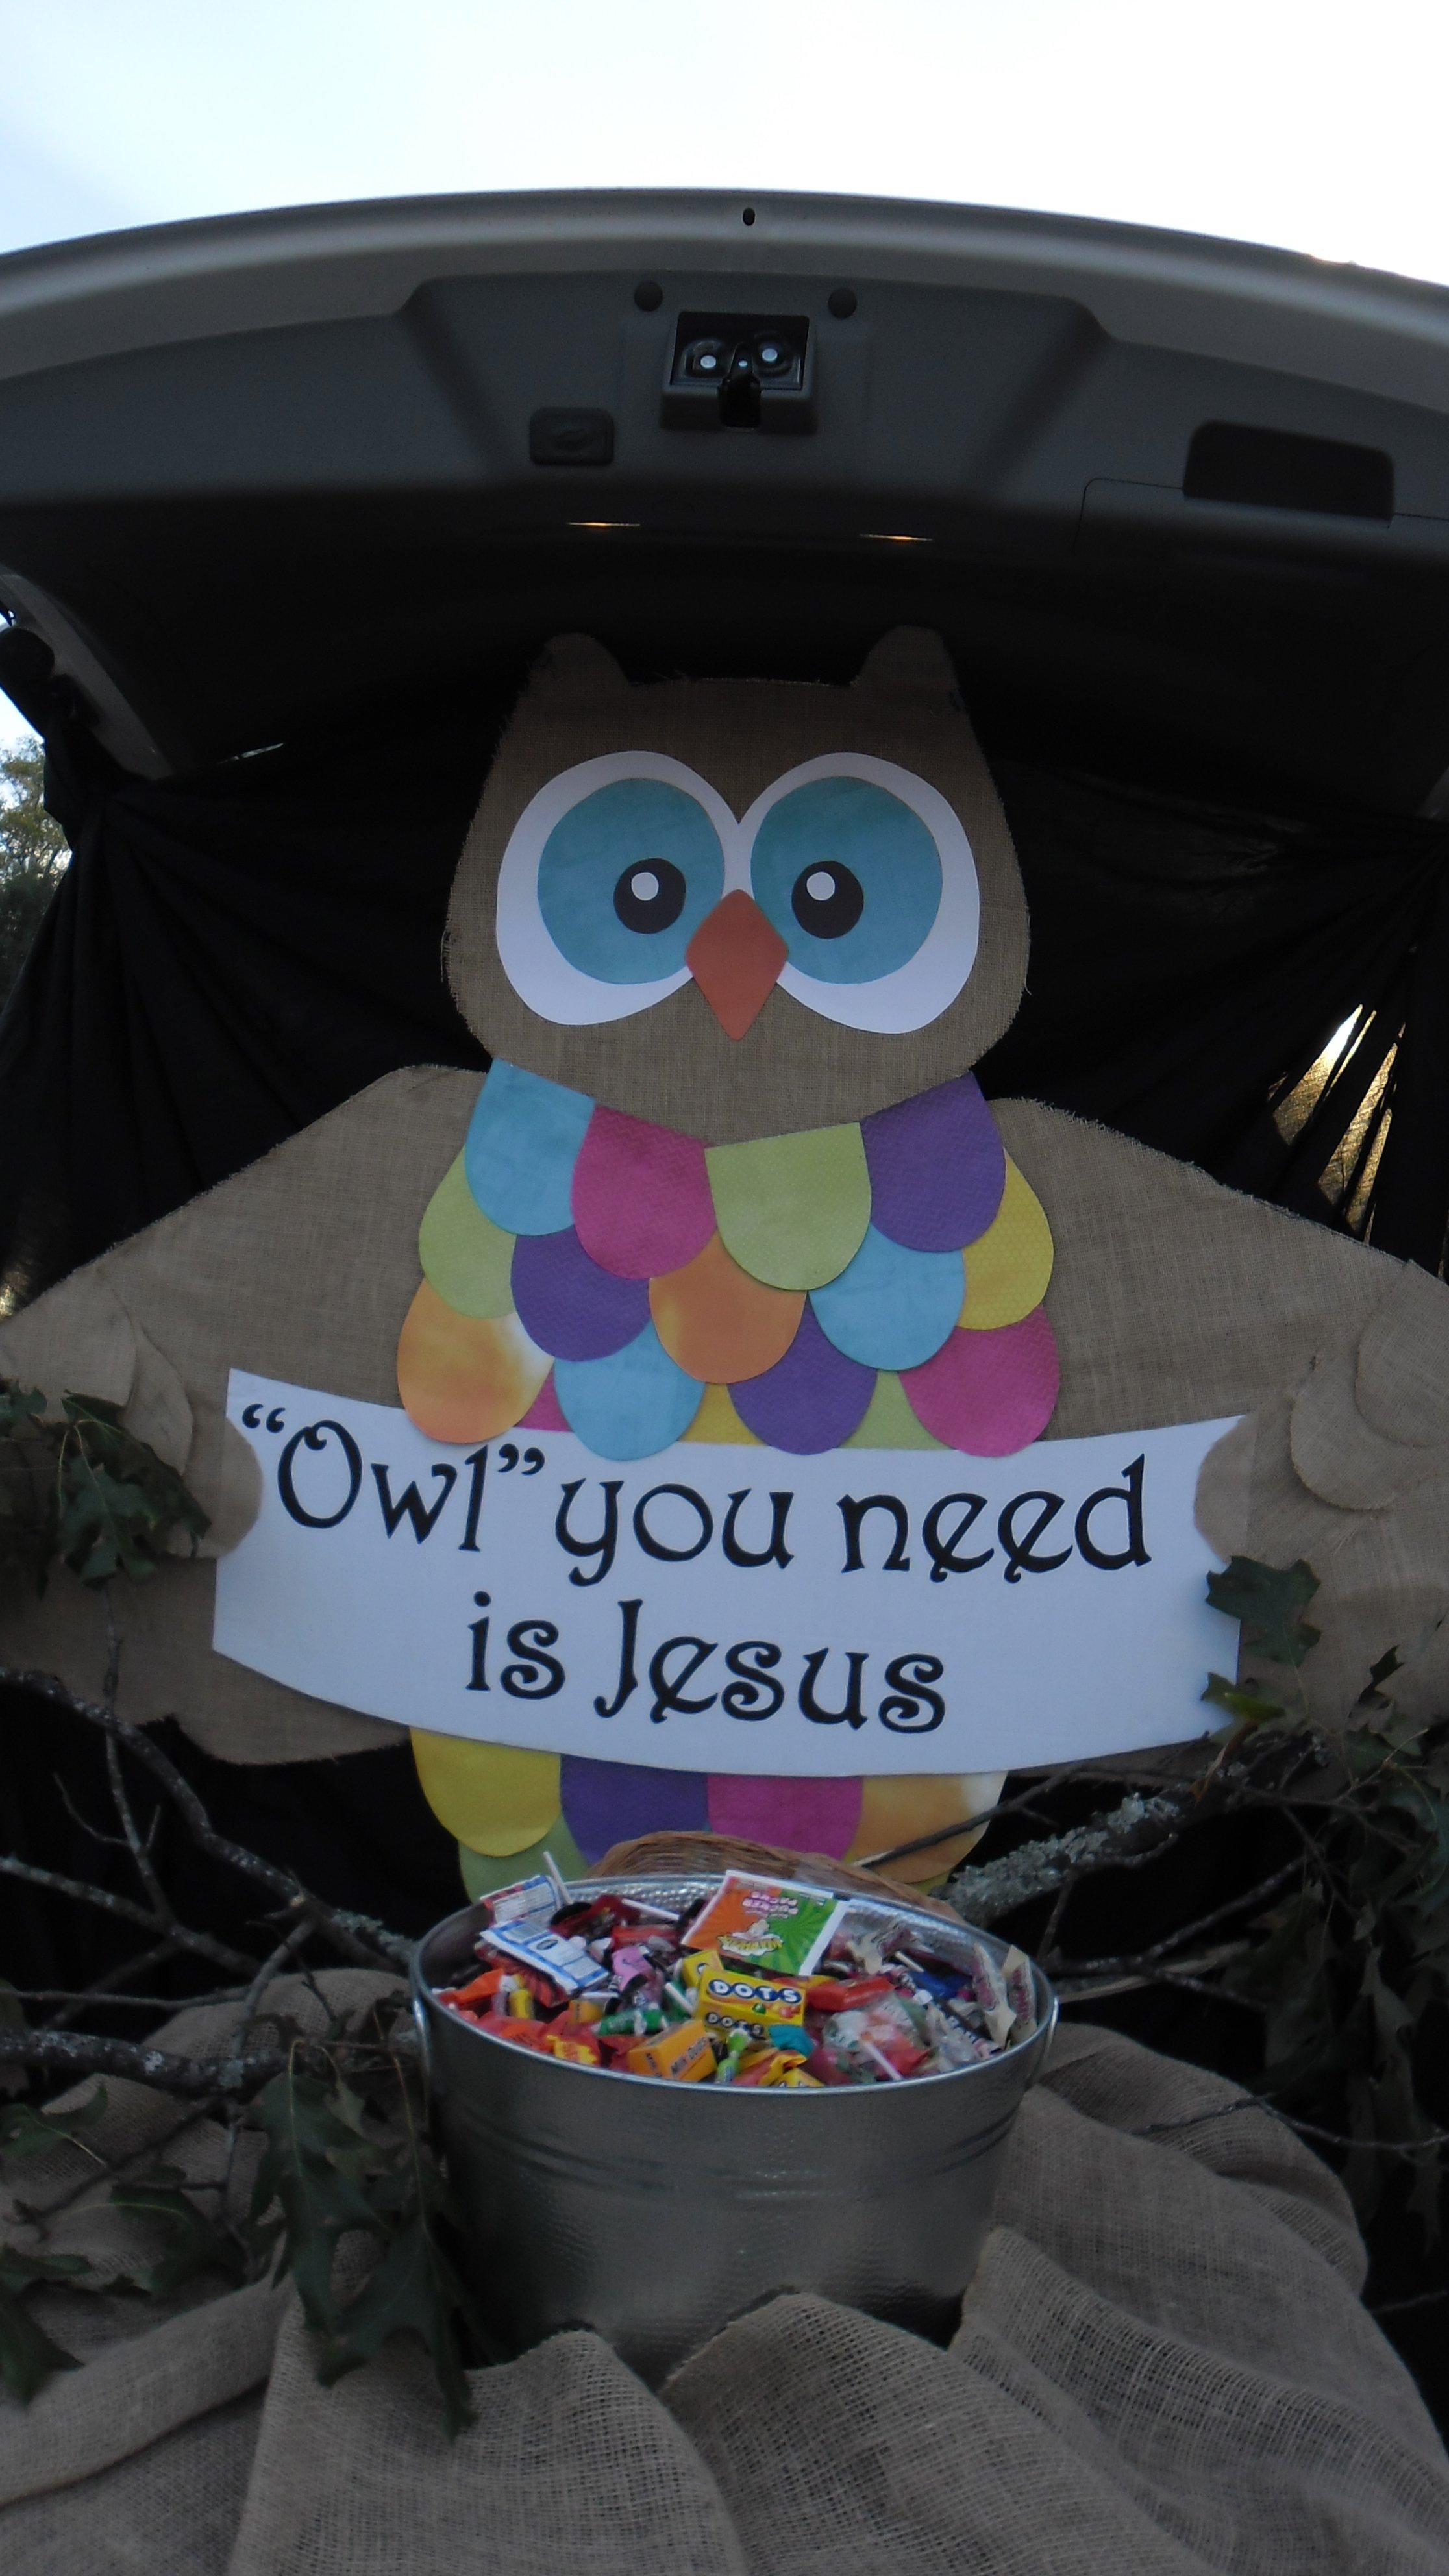 10 Ideal Christian Trunk Or Treat Ideas fbc tallulah la fall carnival trunk or treat owl you need is 3 2020